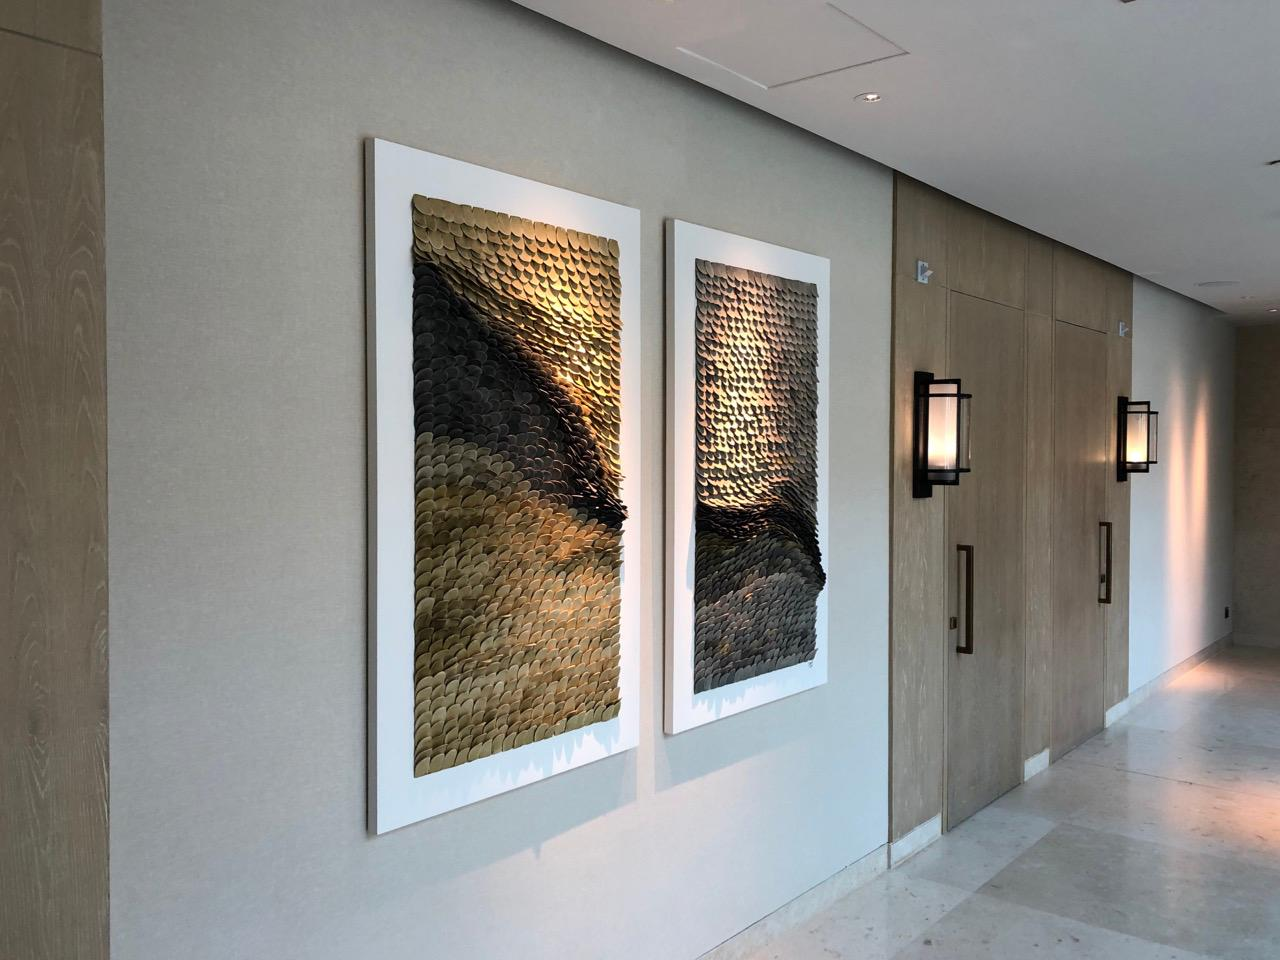 Artbeat Gallery LLC